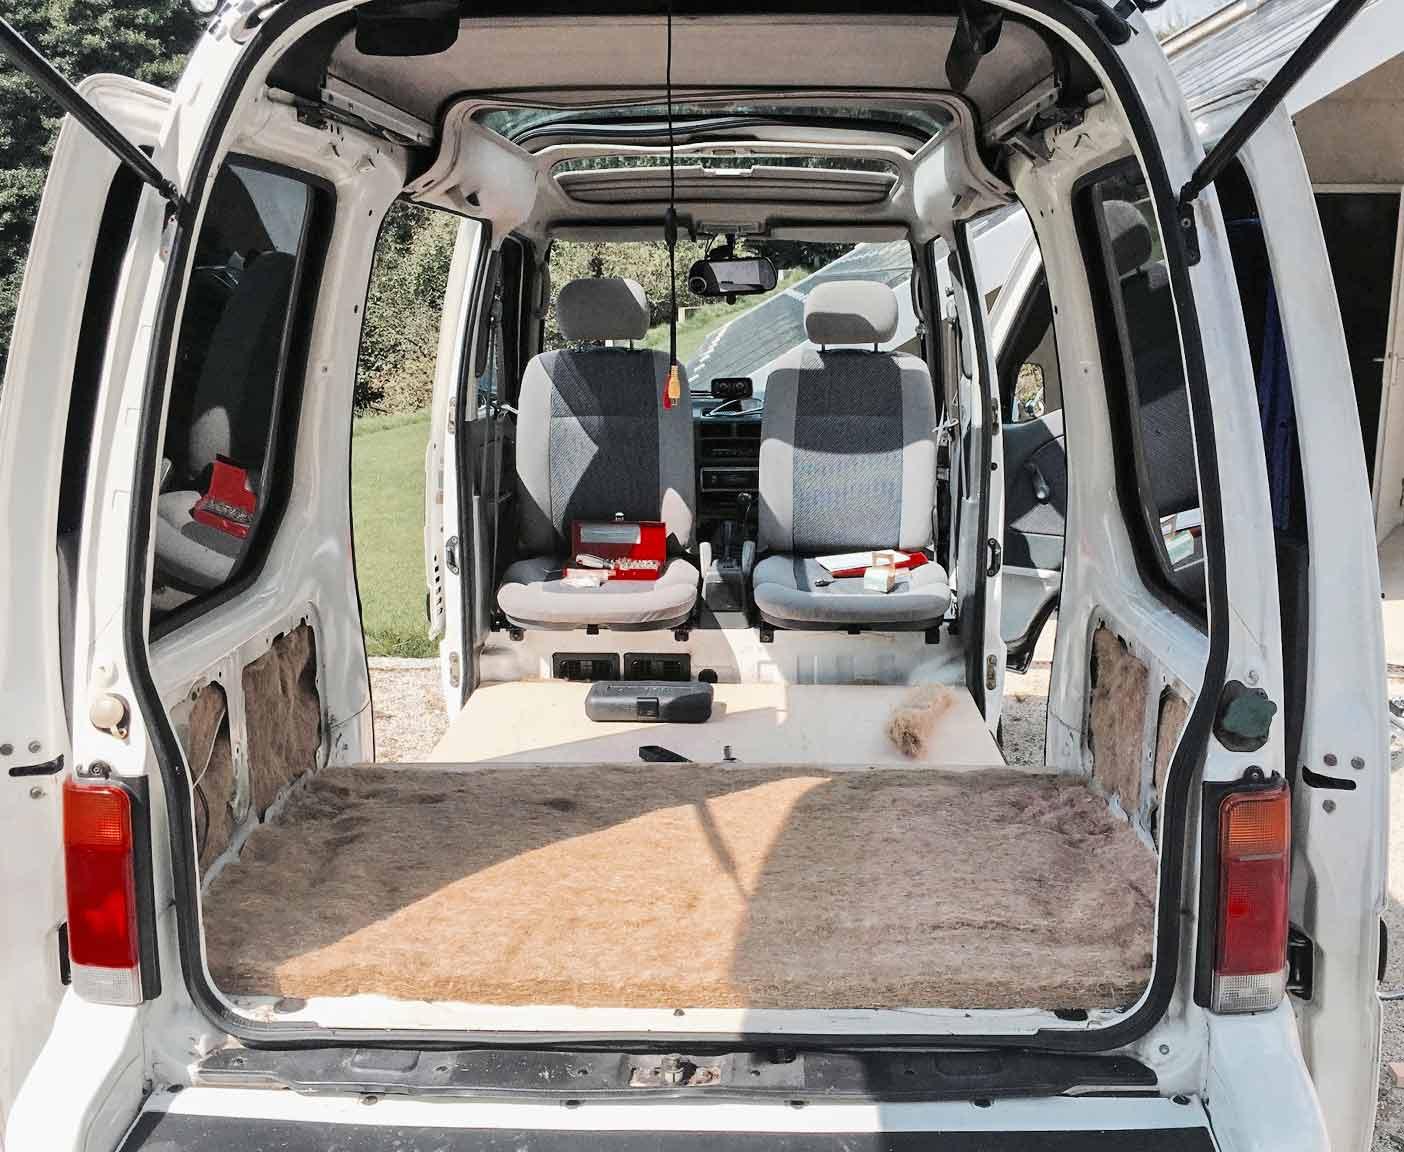 subaru-libero-wohnmobil-umbau-e10-4x4-allrad-camper-minicamper-daihatsu-hijet-piaggio-porter-7